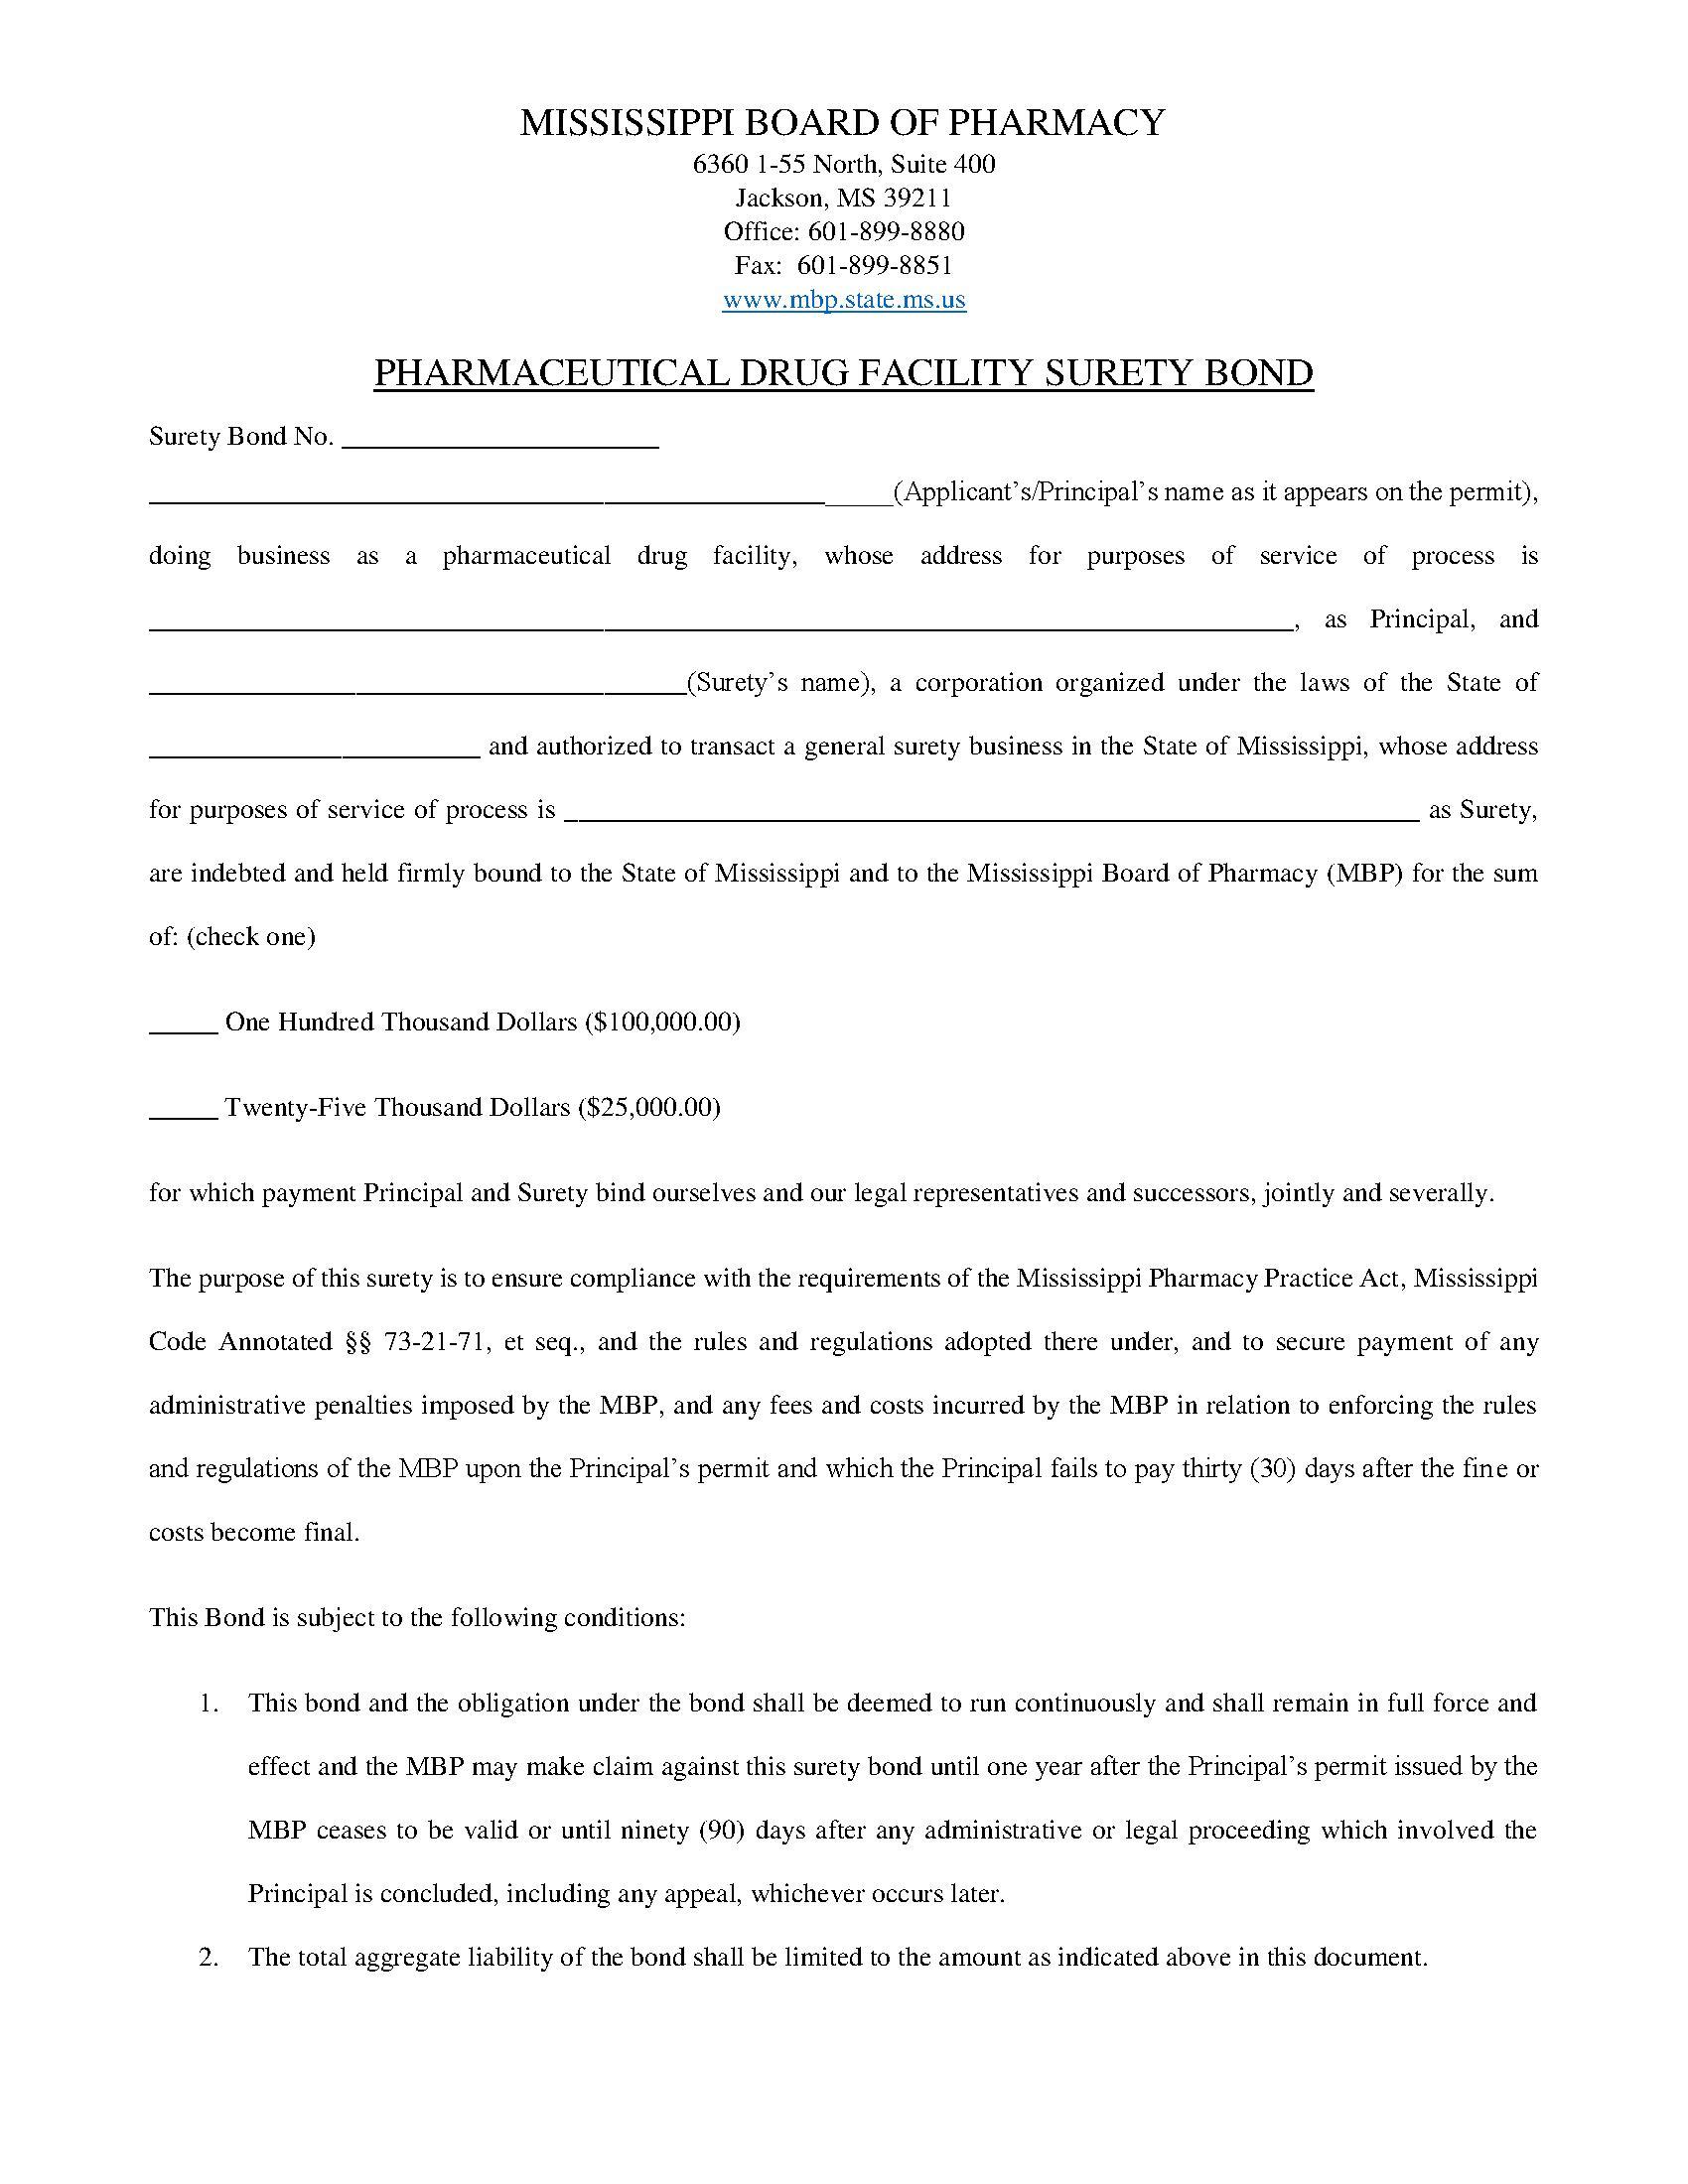 State of Mississippi Pharmaceutical Drug Facility Bond sample image